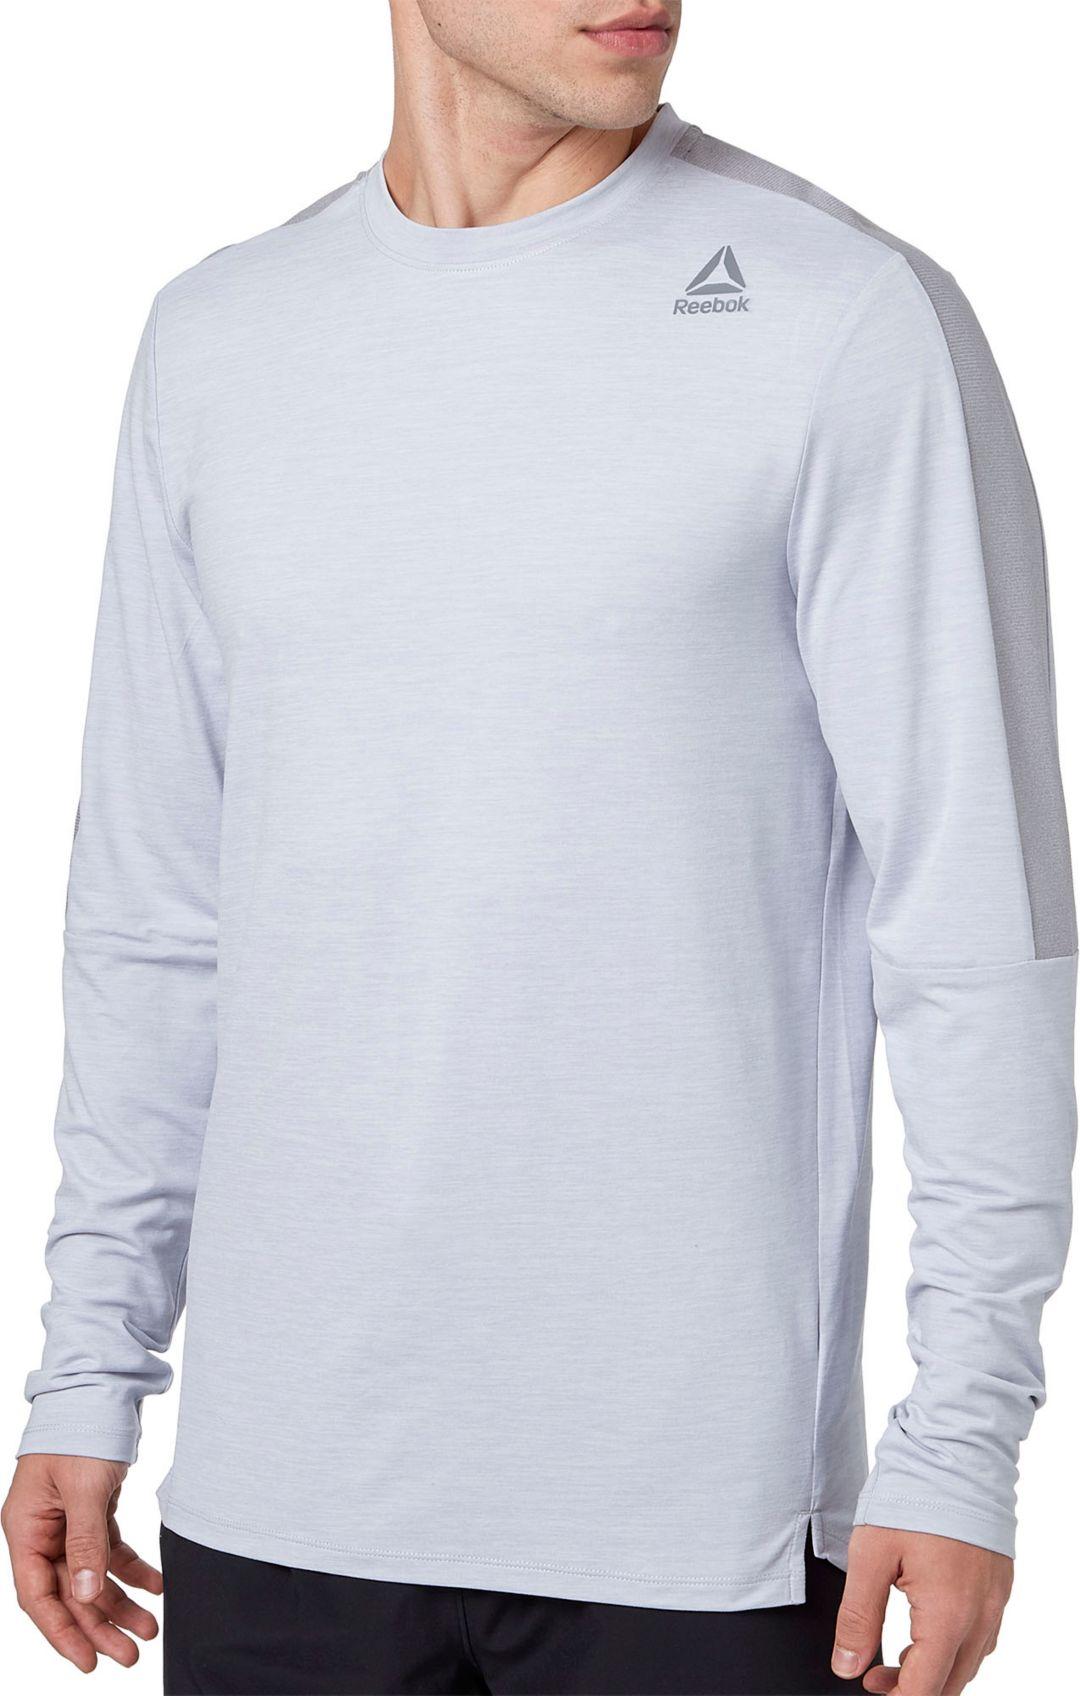 4357326a8daae Reebok Men's 24/7 Crewneck Long Sleeve Shirt